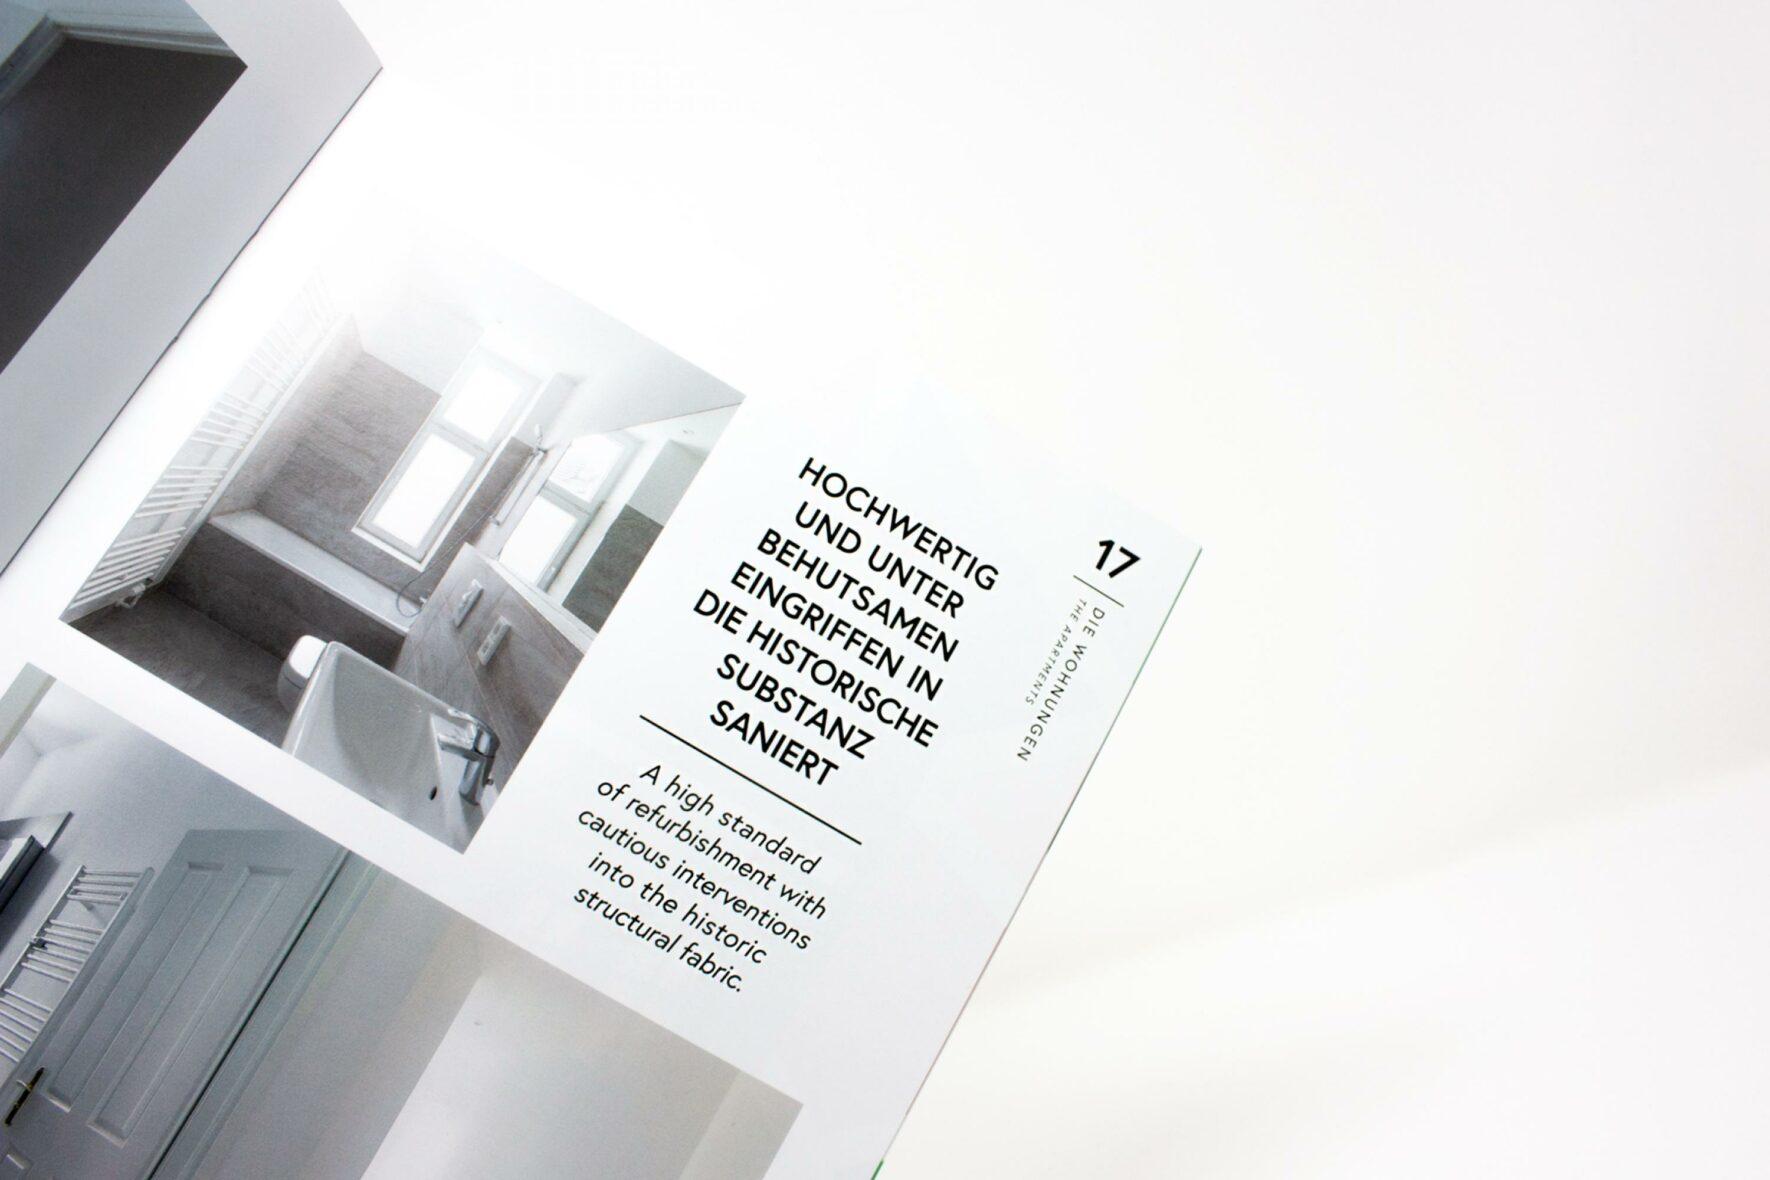 Broschuere-Osloer-Immobilienbranding-Trendcity-FORMLOS-berlin-16